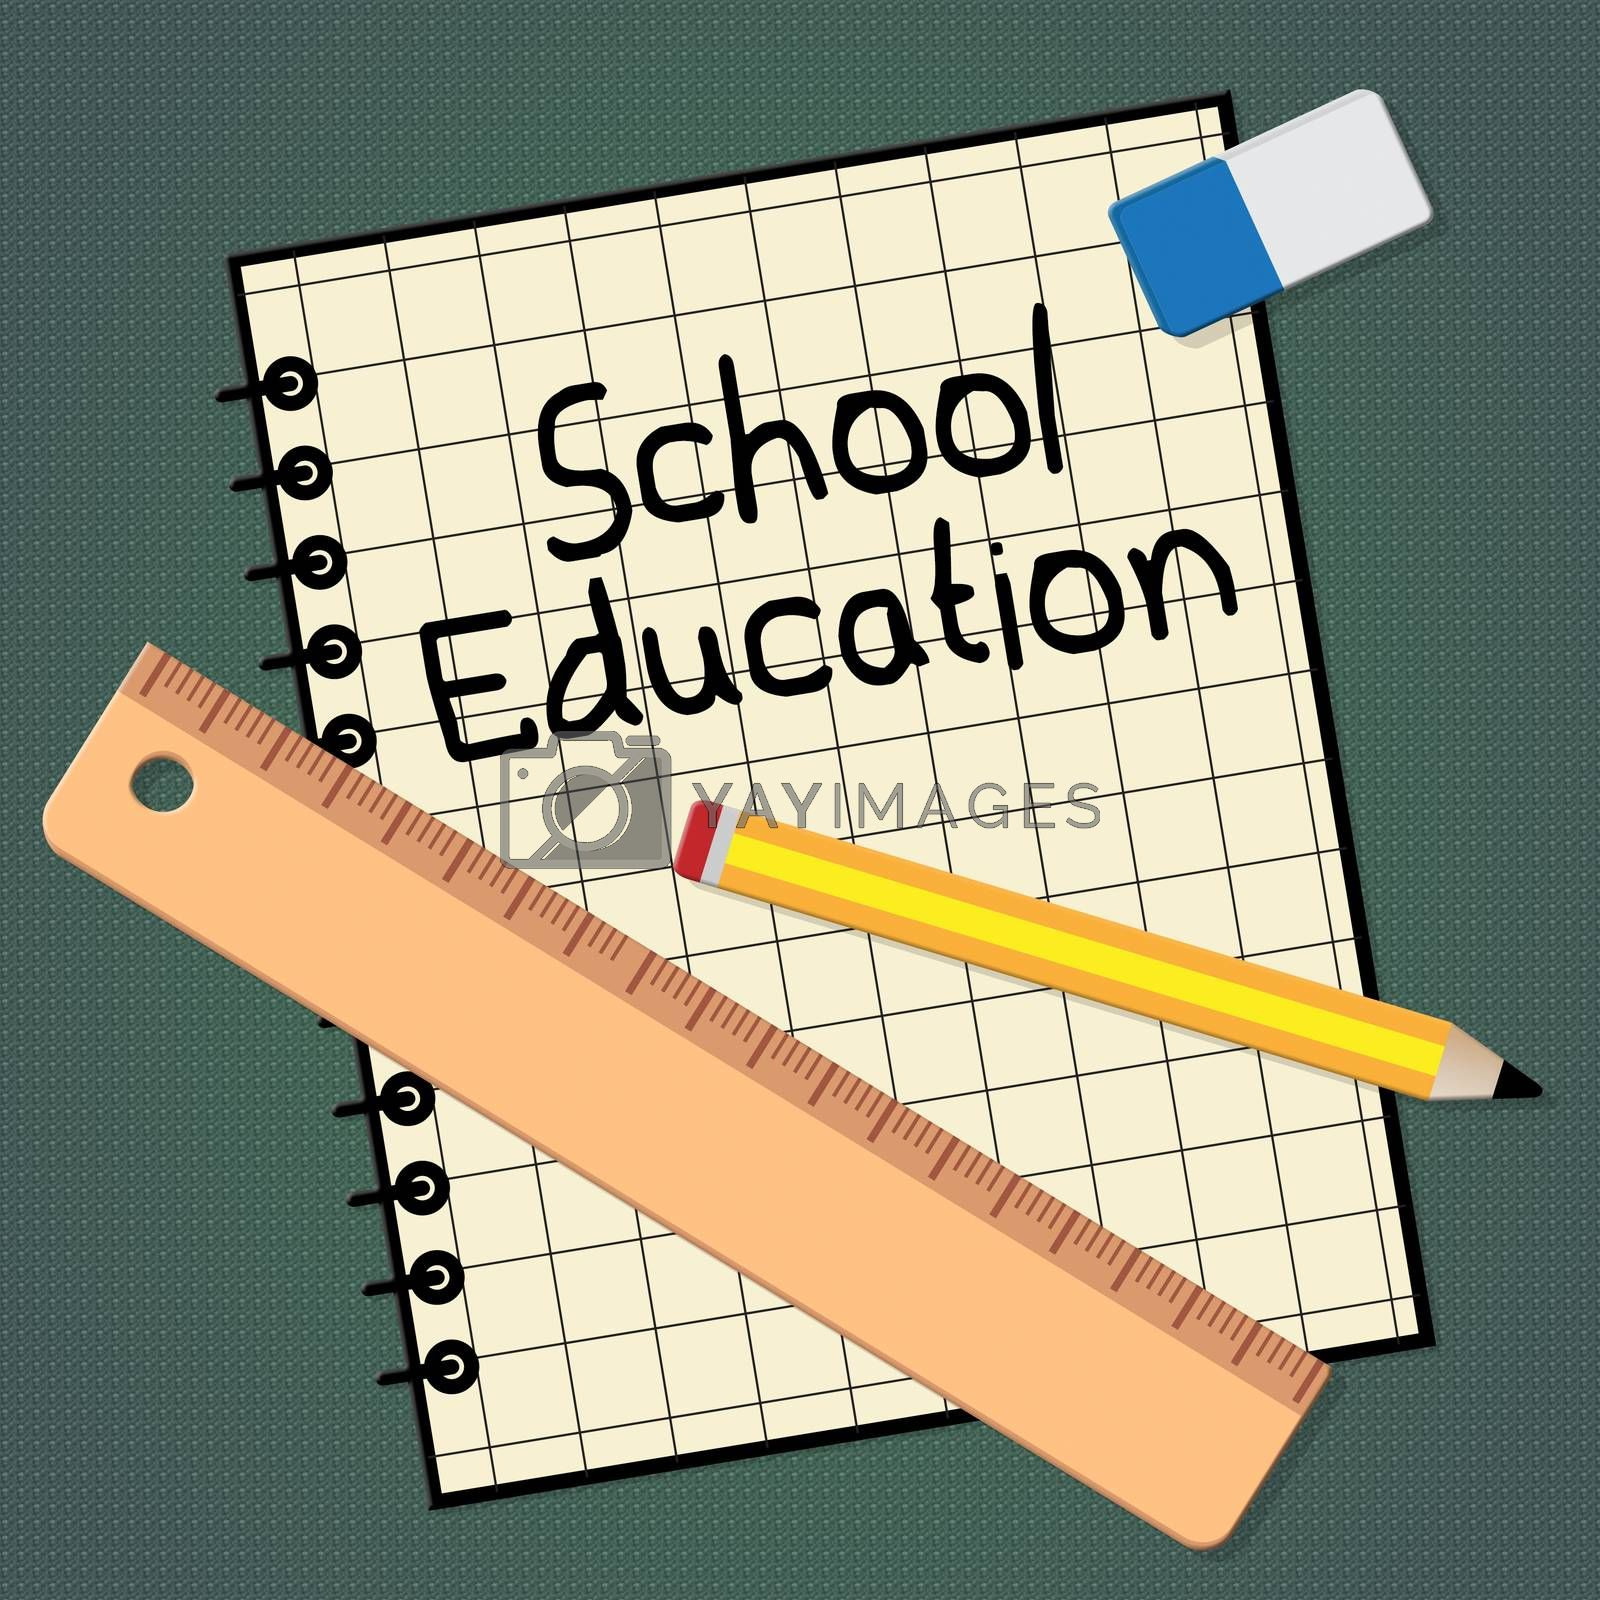 School Education Notebook Representing Kids Education 3d Illustration